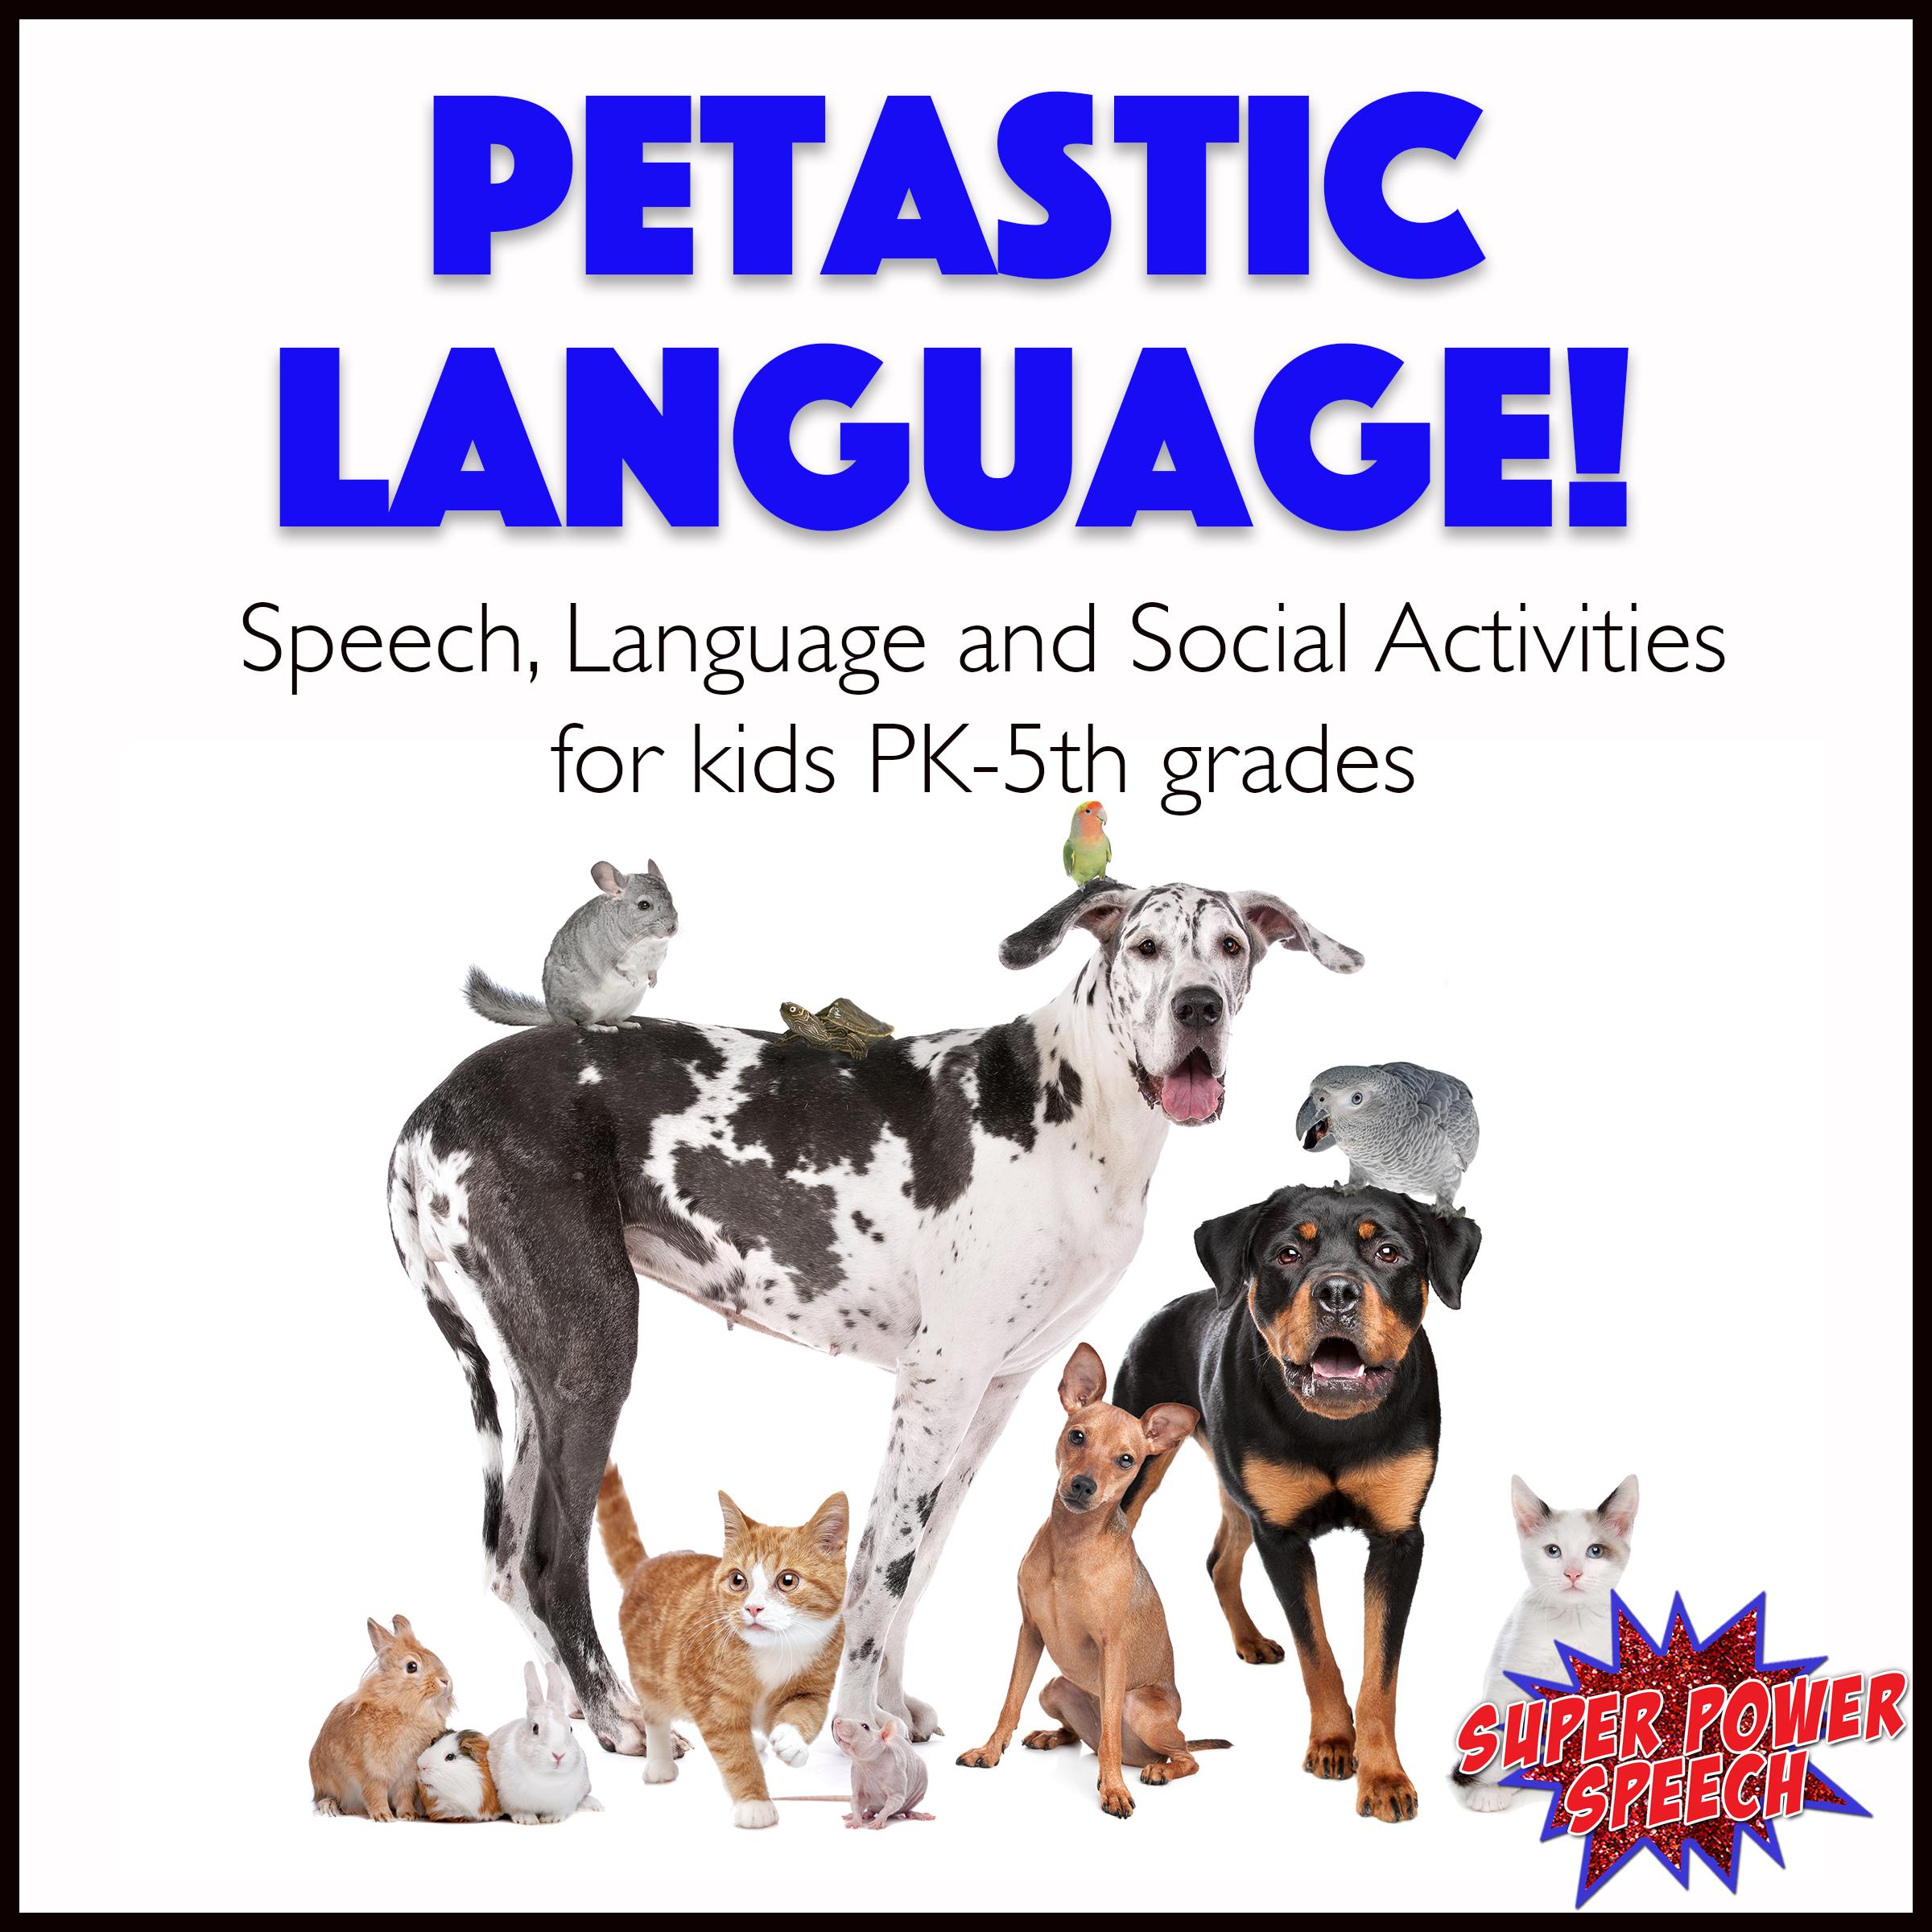 Using Animals to Promote Language Skills — Super Power Speech